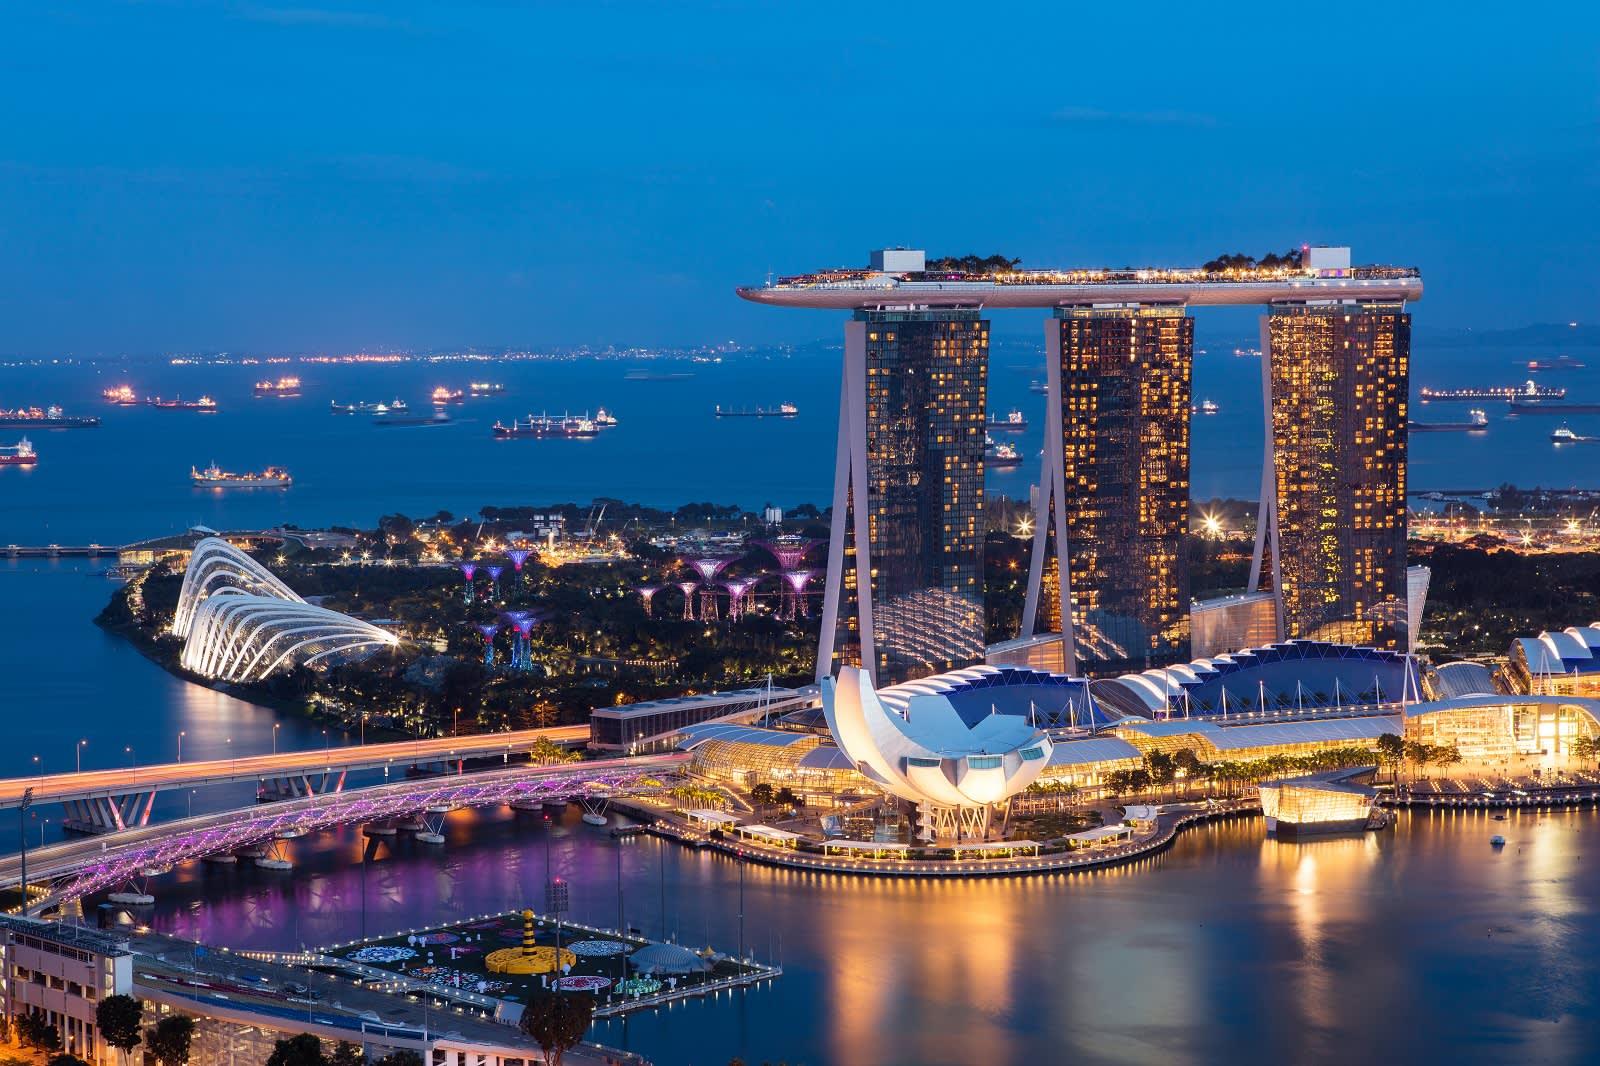 Enchanting Travels Asia Tours Singapore Tourism Marina bay